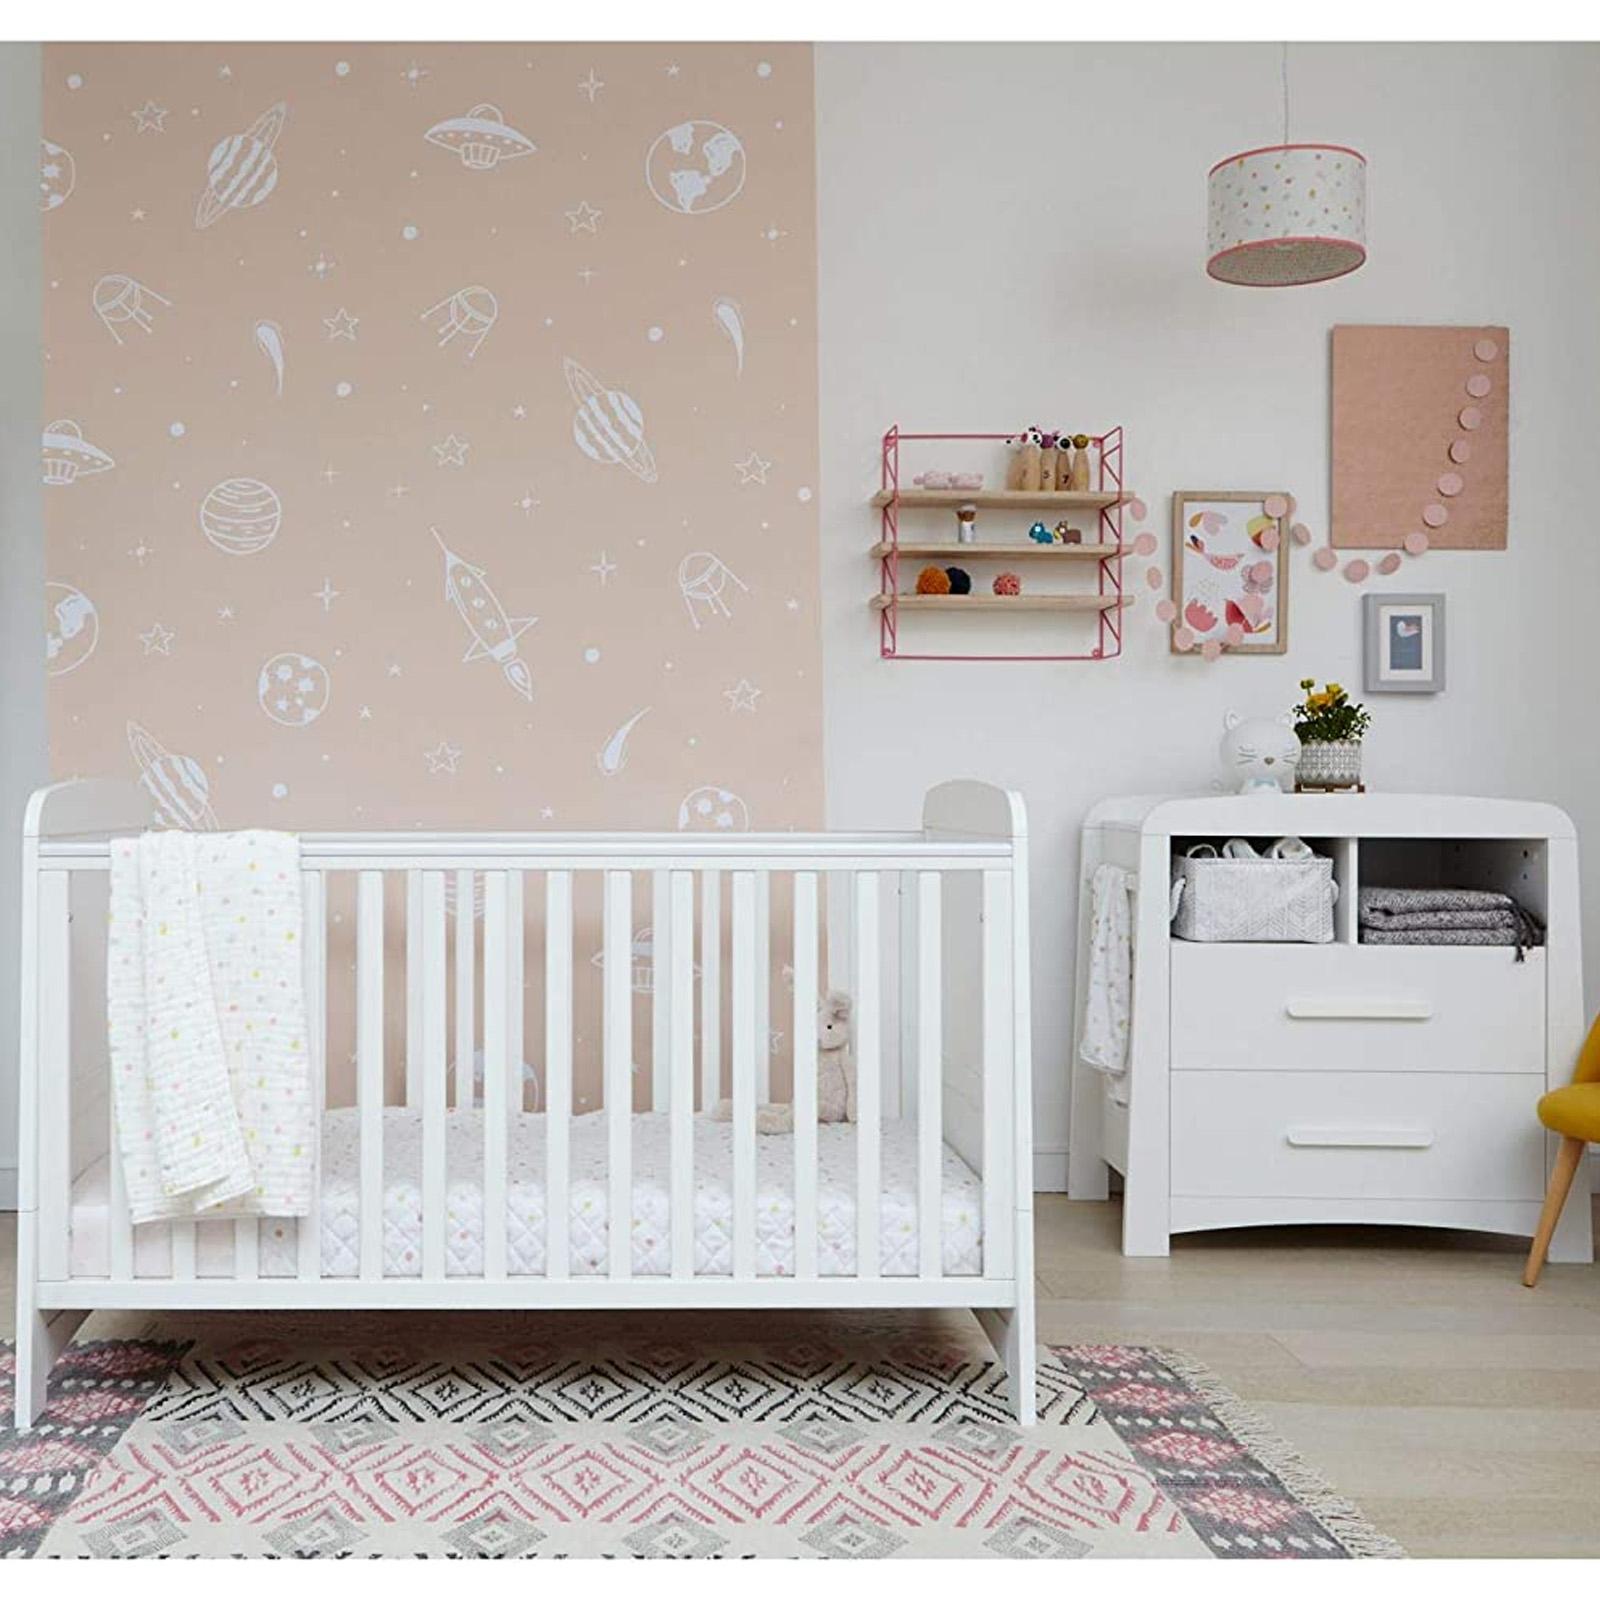 Mothercare Little Acorns Somerton Cot Bed 2 Piece Nursery